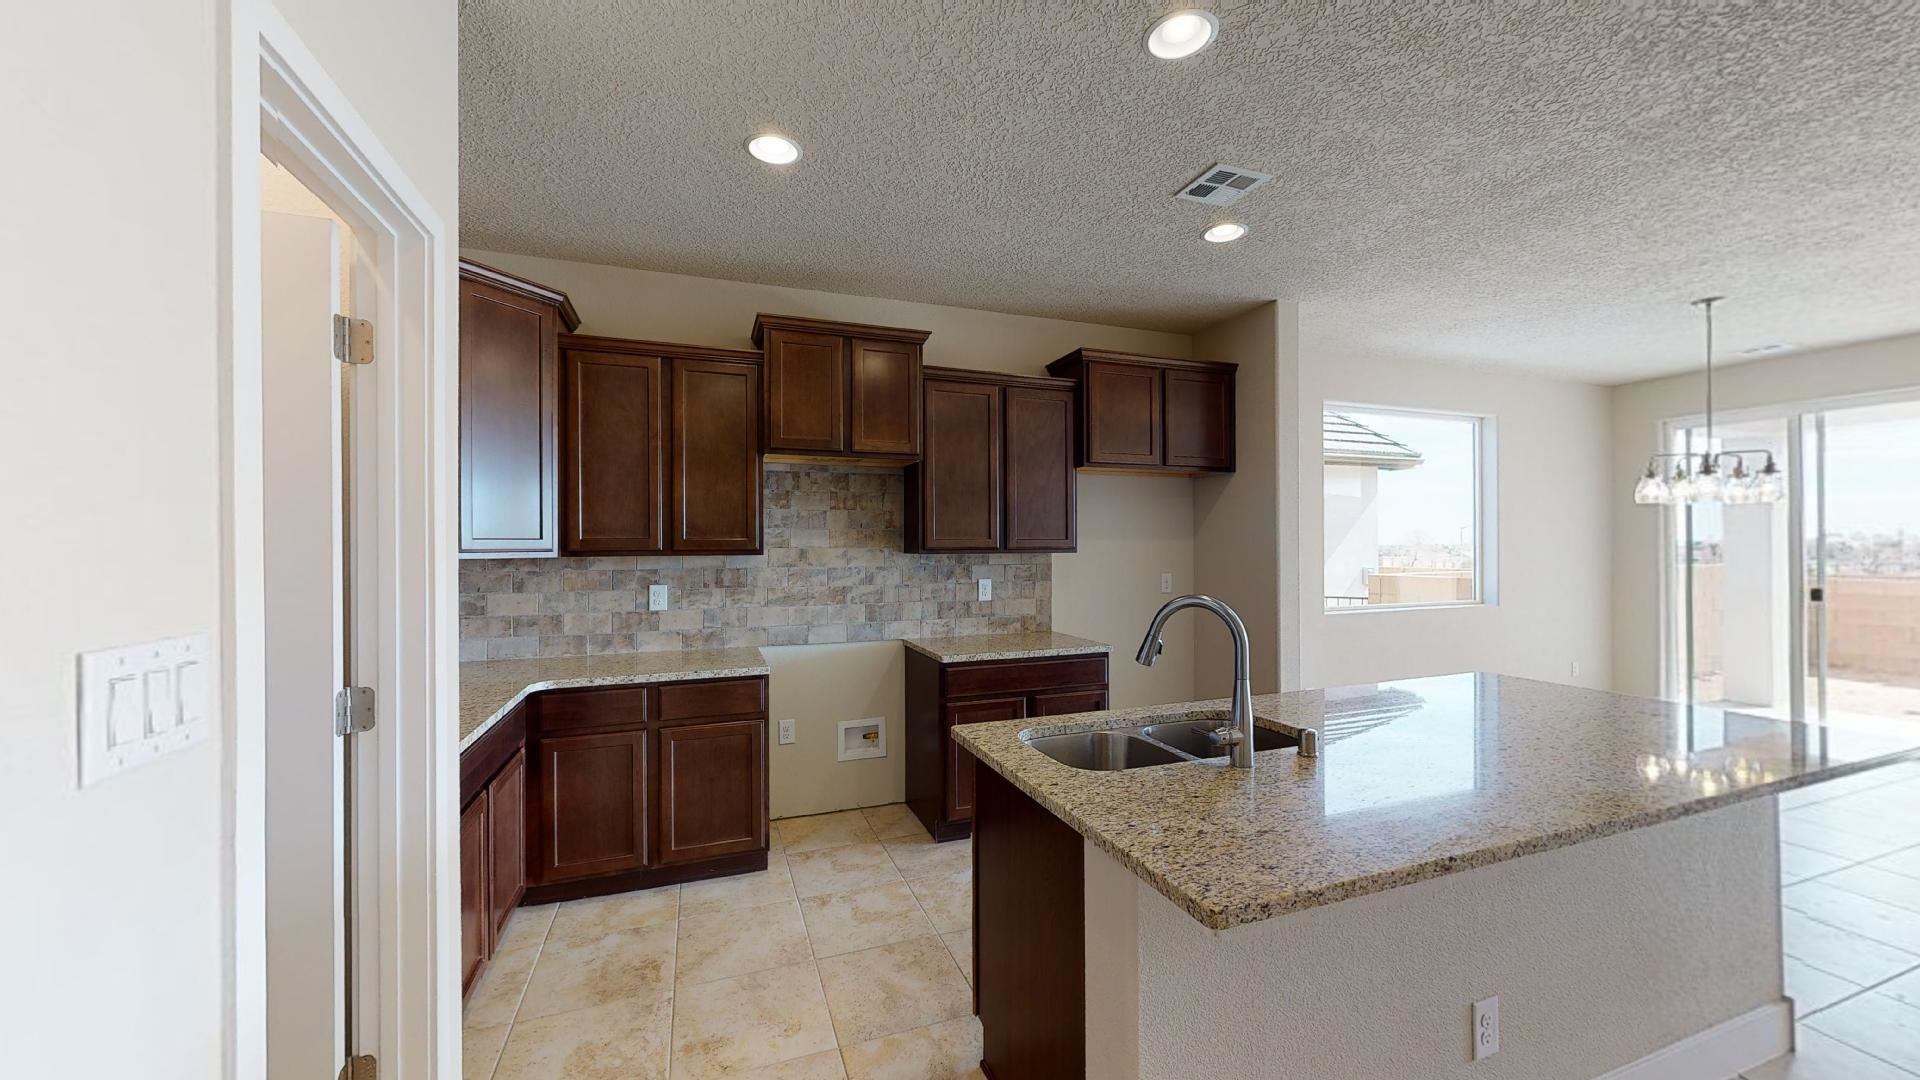 Photo of 6909 Pina Way NE, Rio Rancho, NM 87144 (MLS # 1000913)